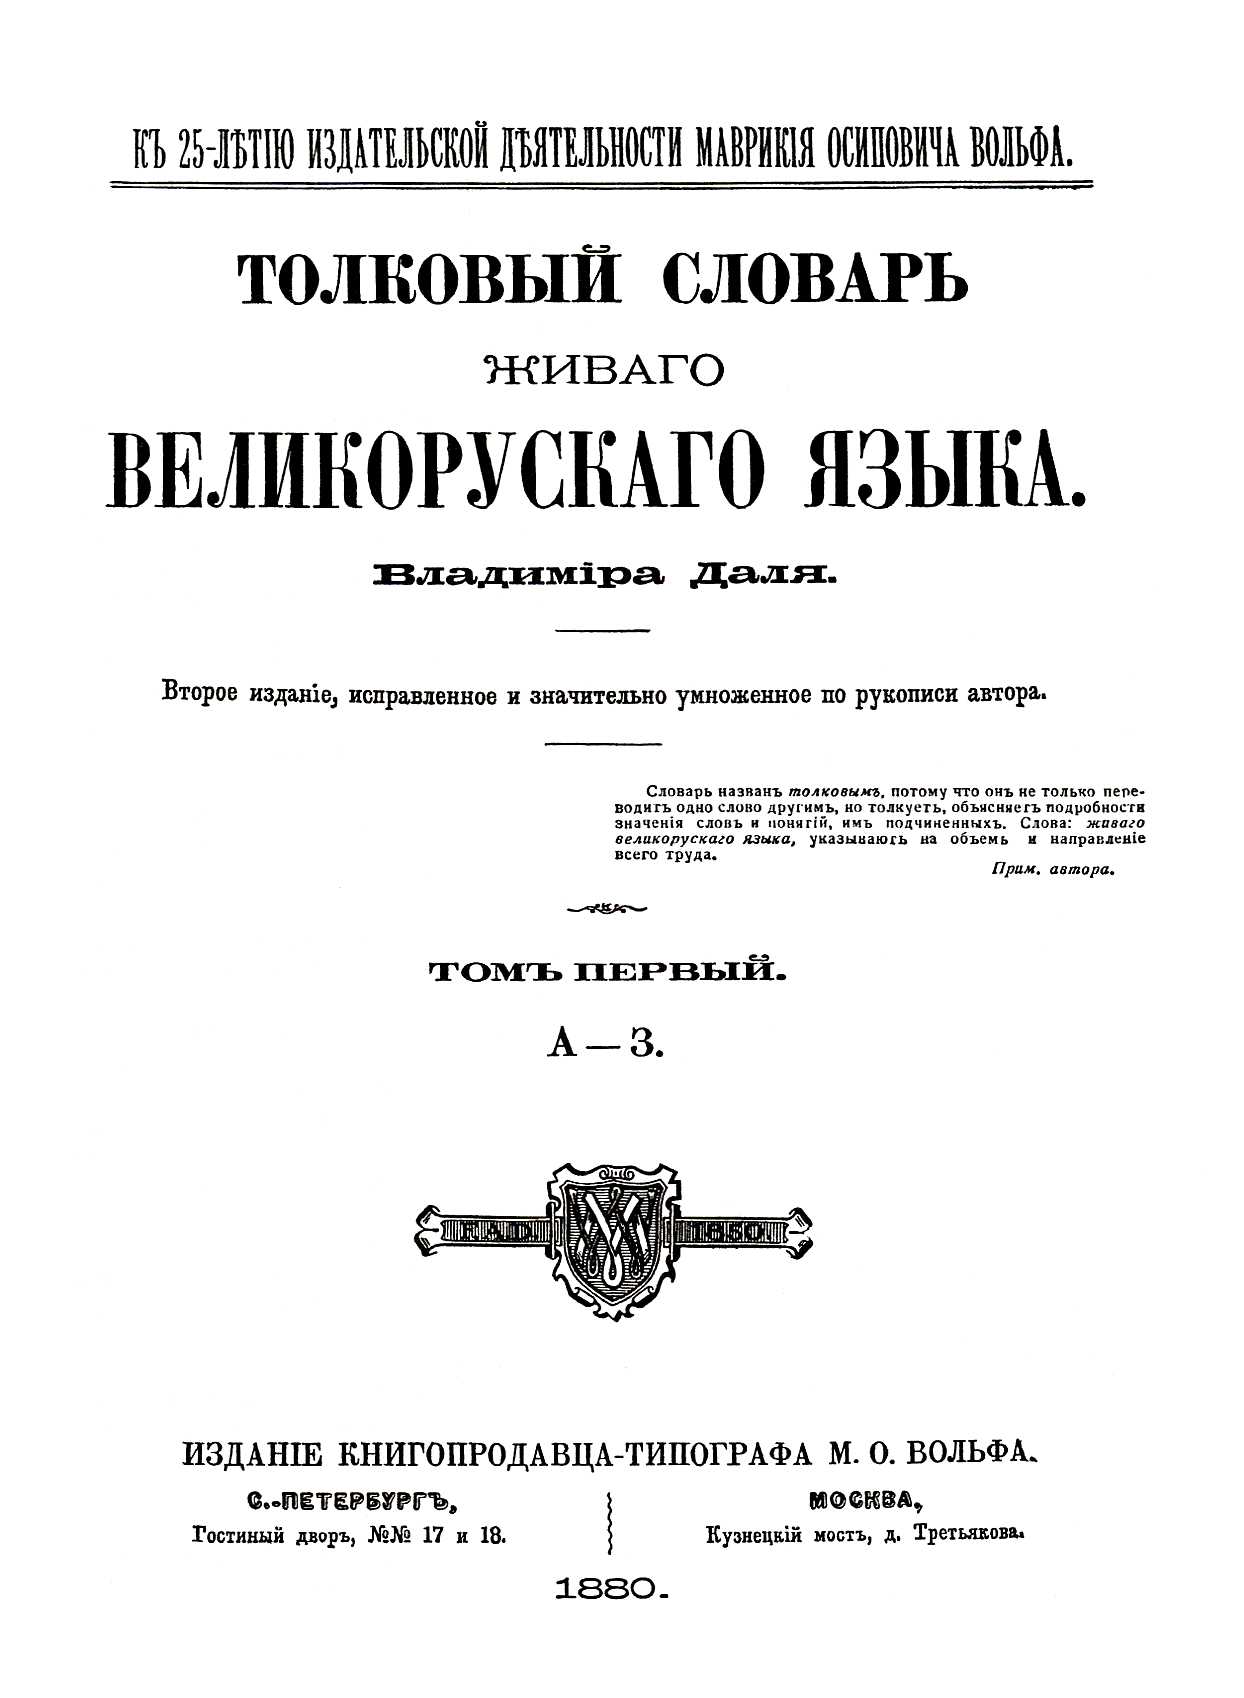 Значение слова реферат википедия 1601